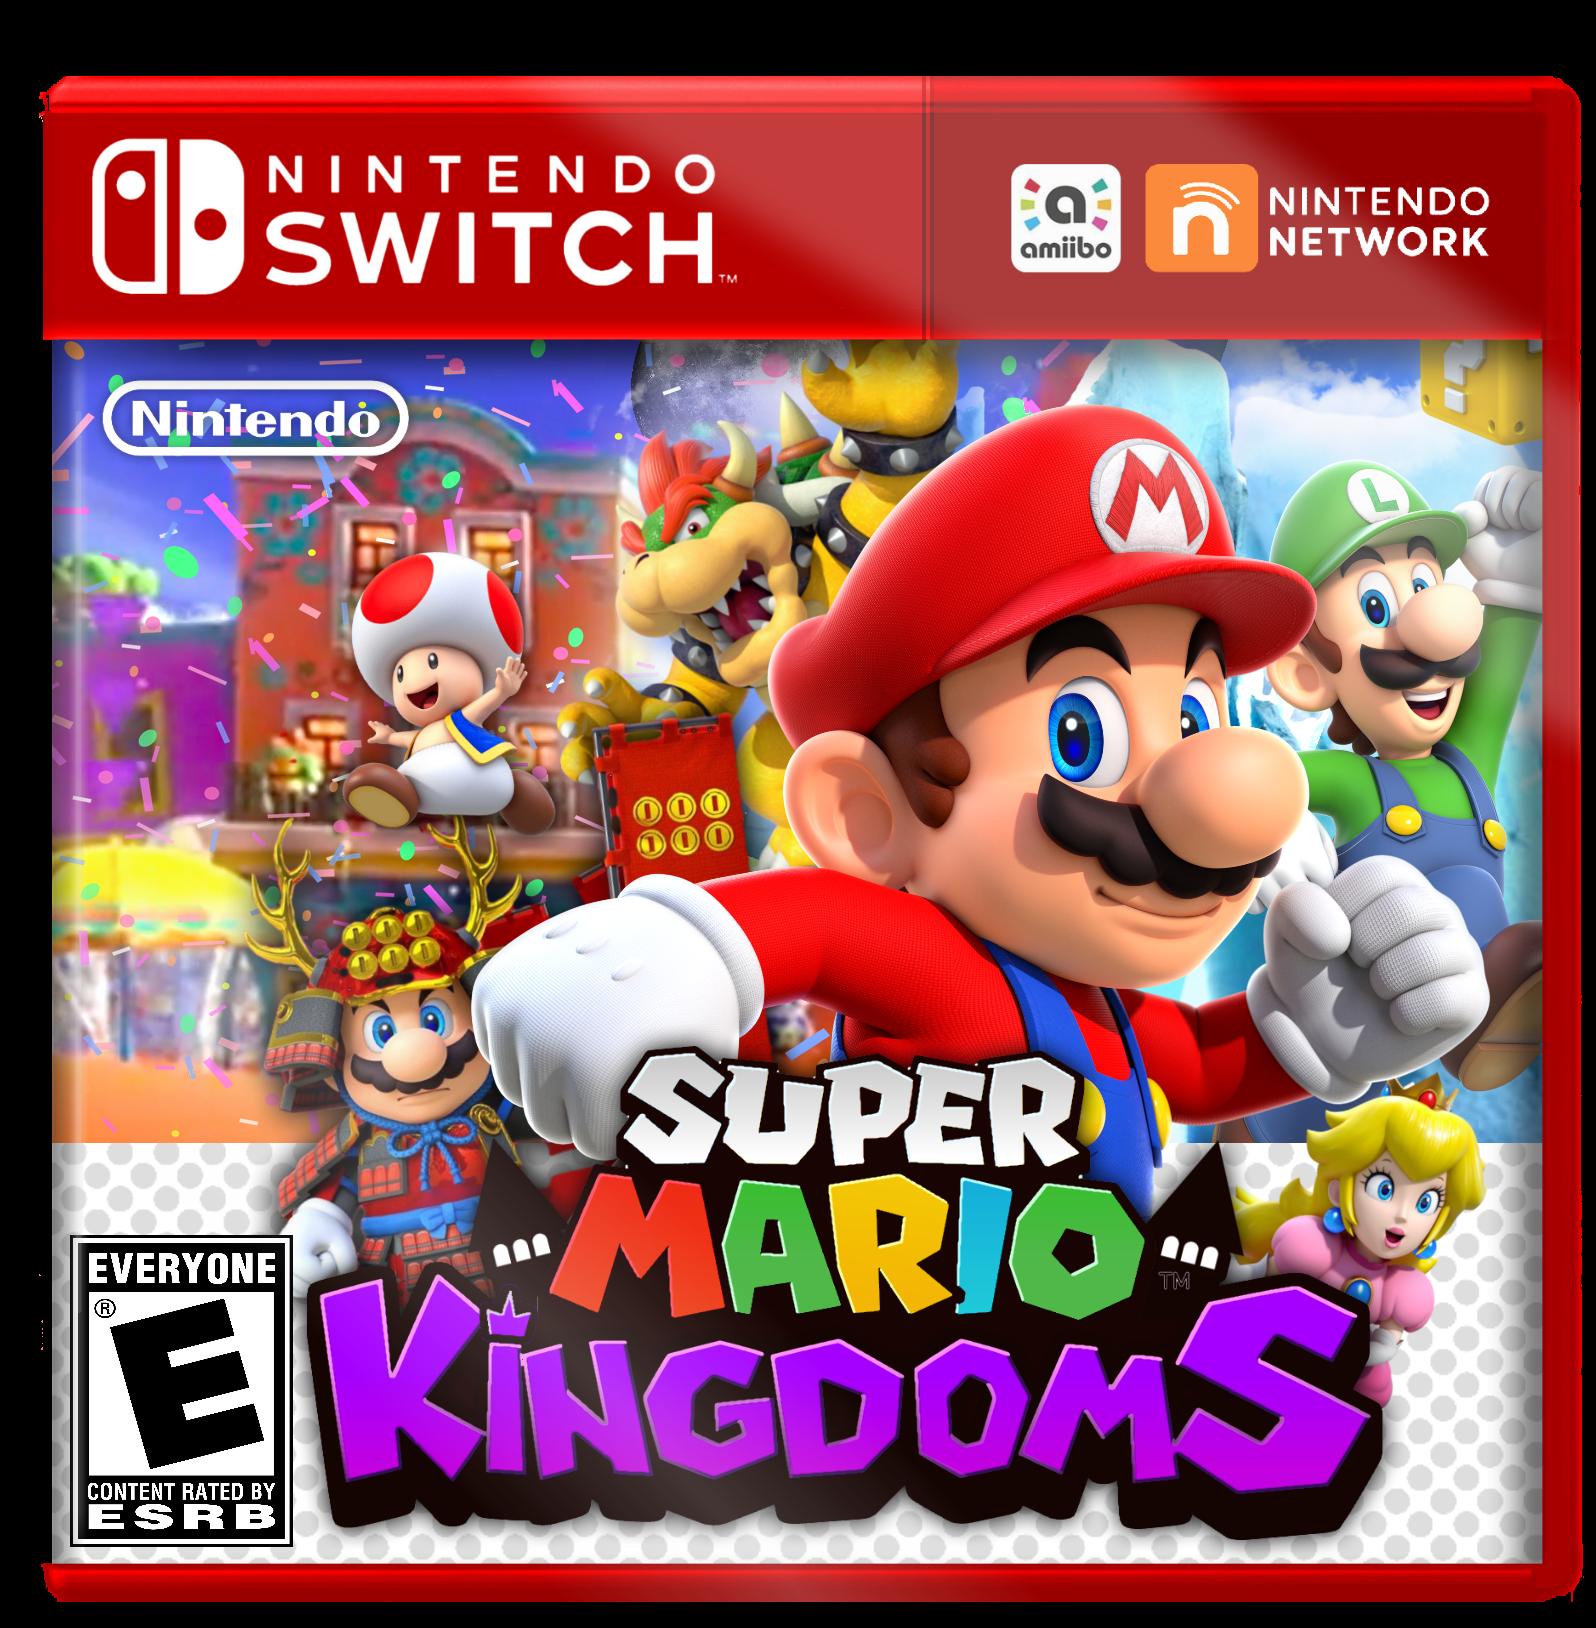 Nintendo Switch Boxart Mock-Up - Super Mario Kingdoms by